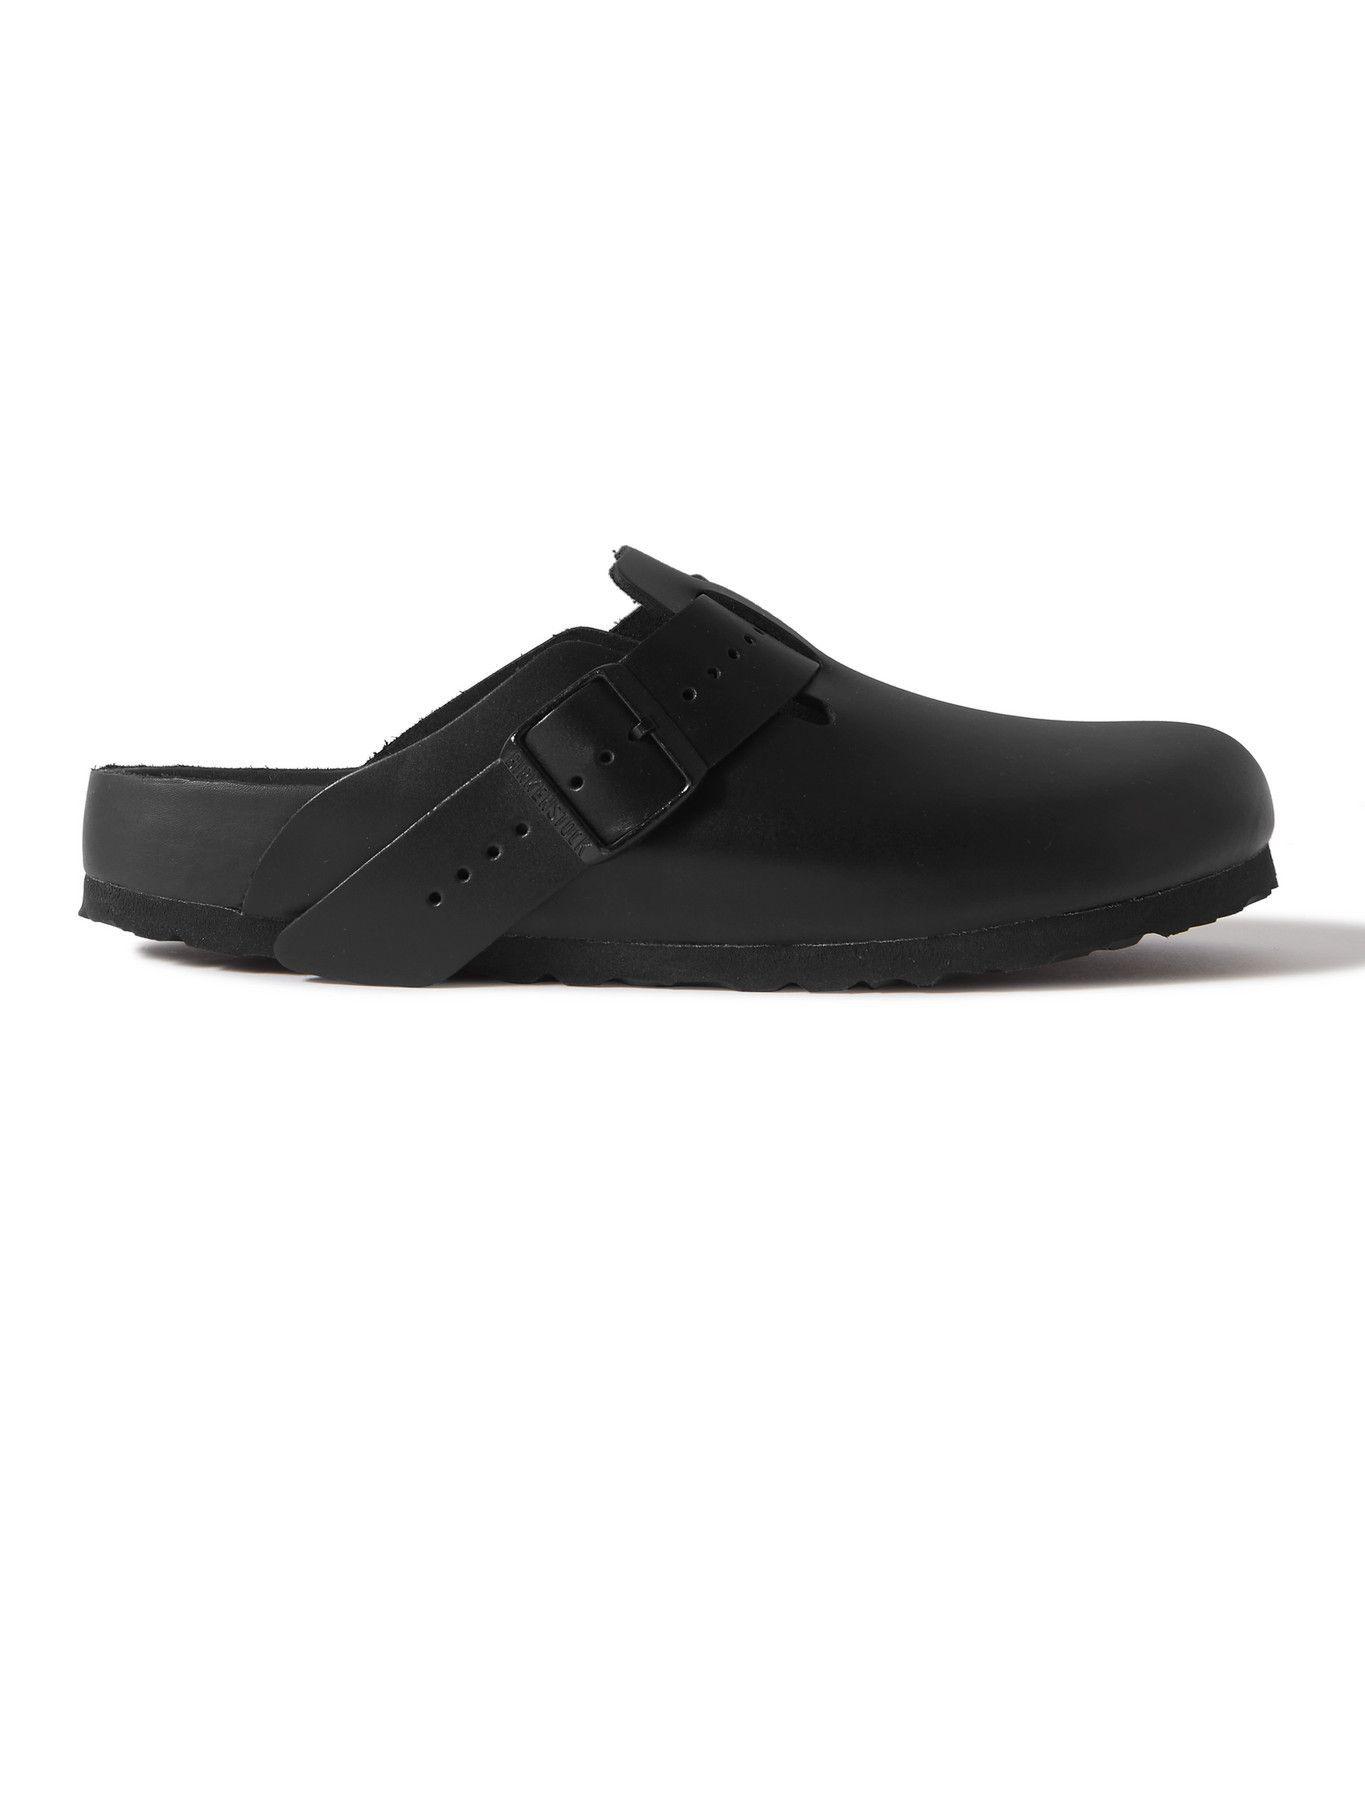 Photo: RICK OWENS - Birkenstock Boston Leather Sandals - Black